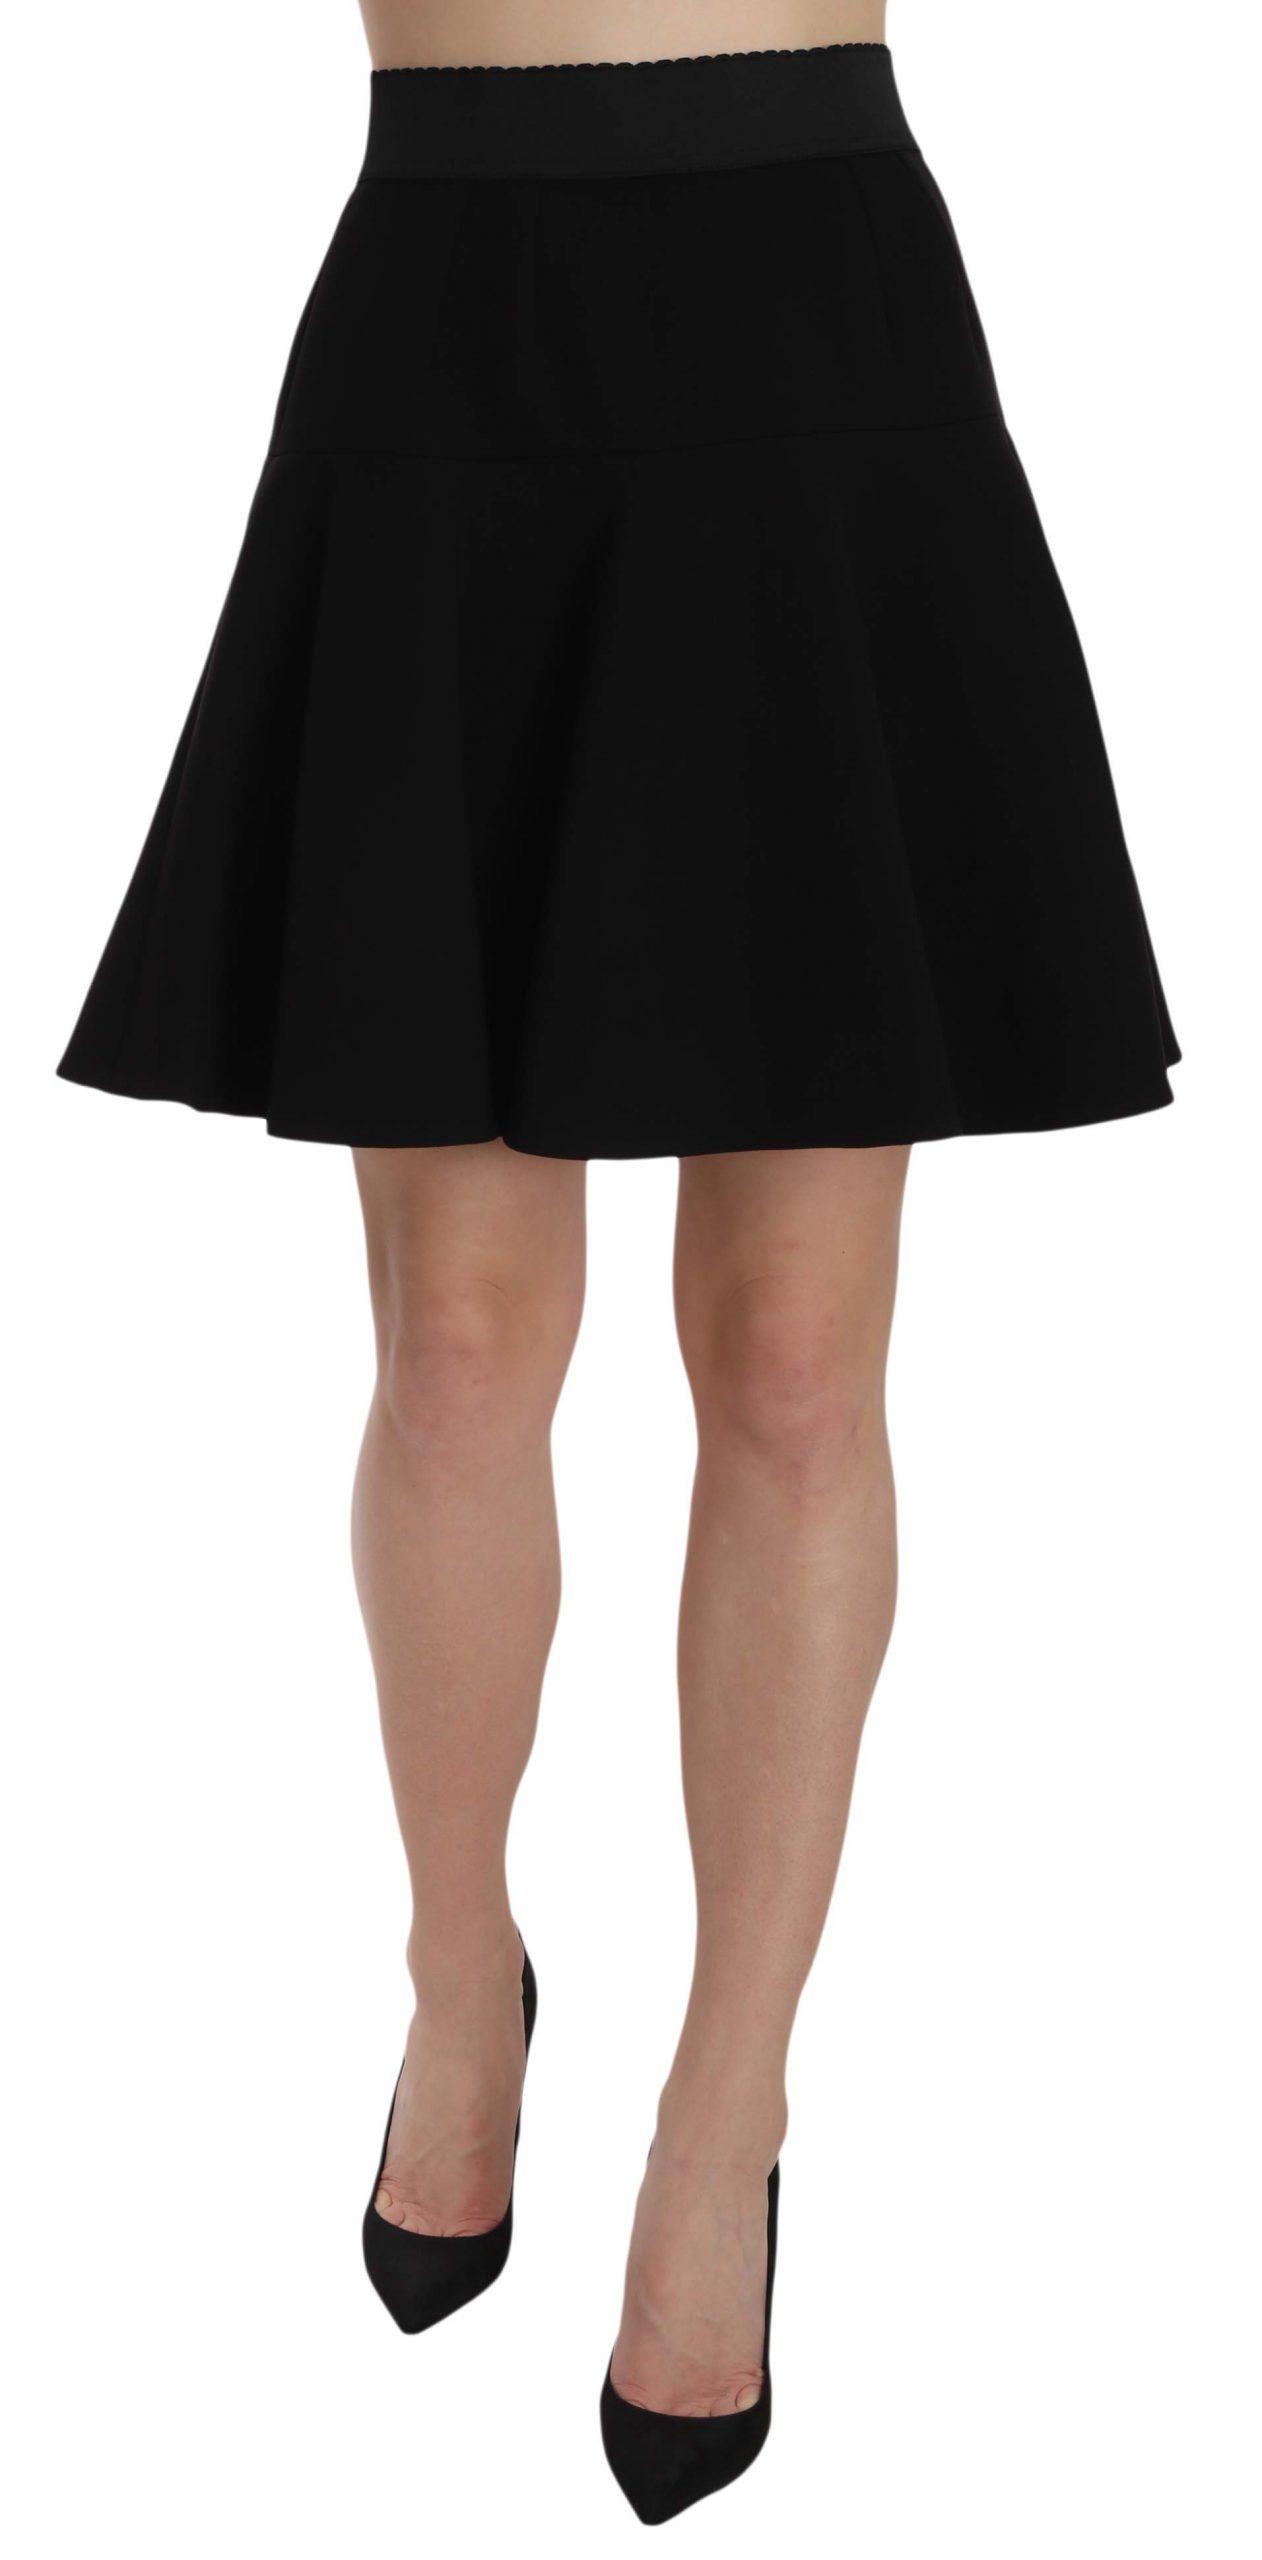 Dolce & Gabbana Women's Solid A-line Fluted Waist Skirt Black SKI1170 - IT40|S